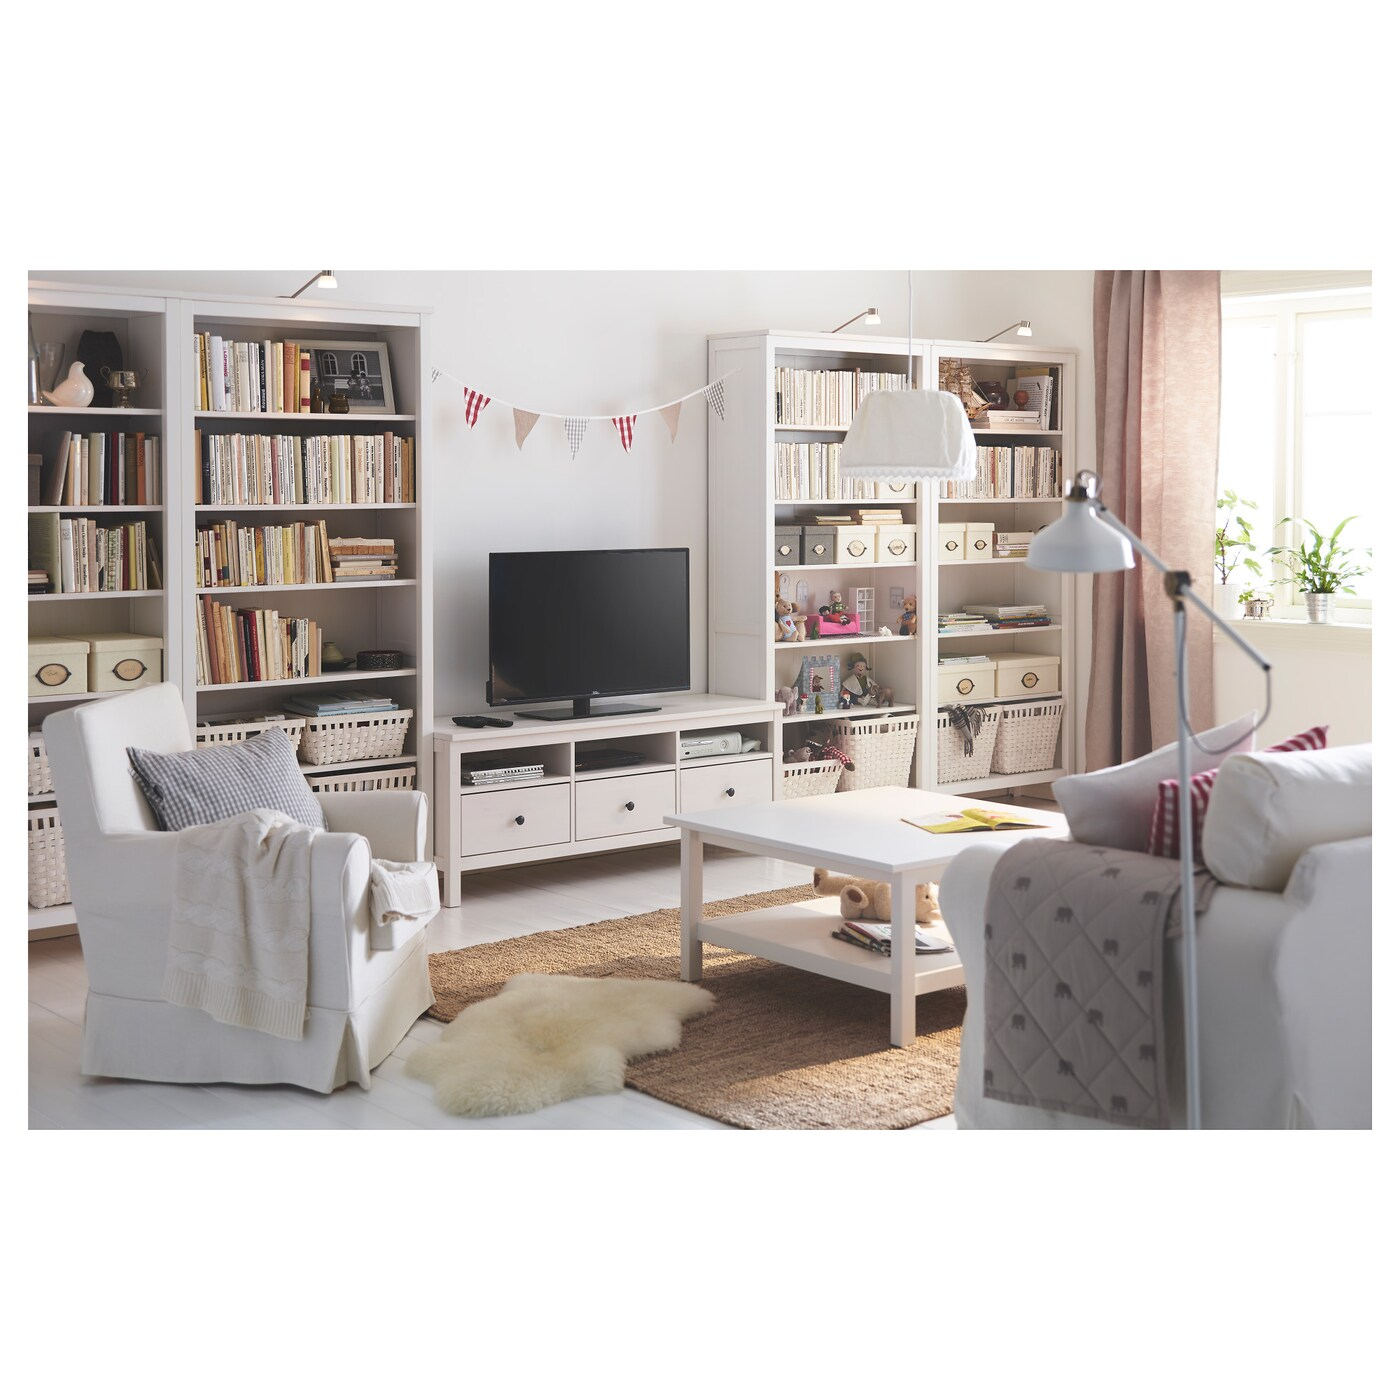 Hemnes mueble tv tinte blanco 148 x 47 x 57 cm ikea for Mueble tv ikea